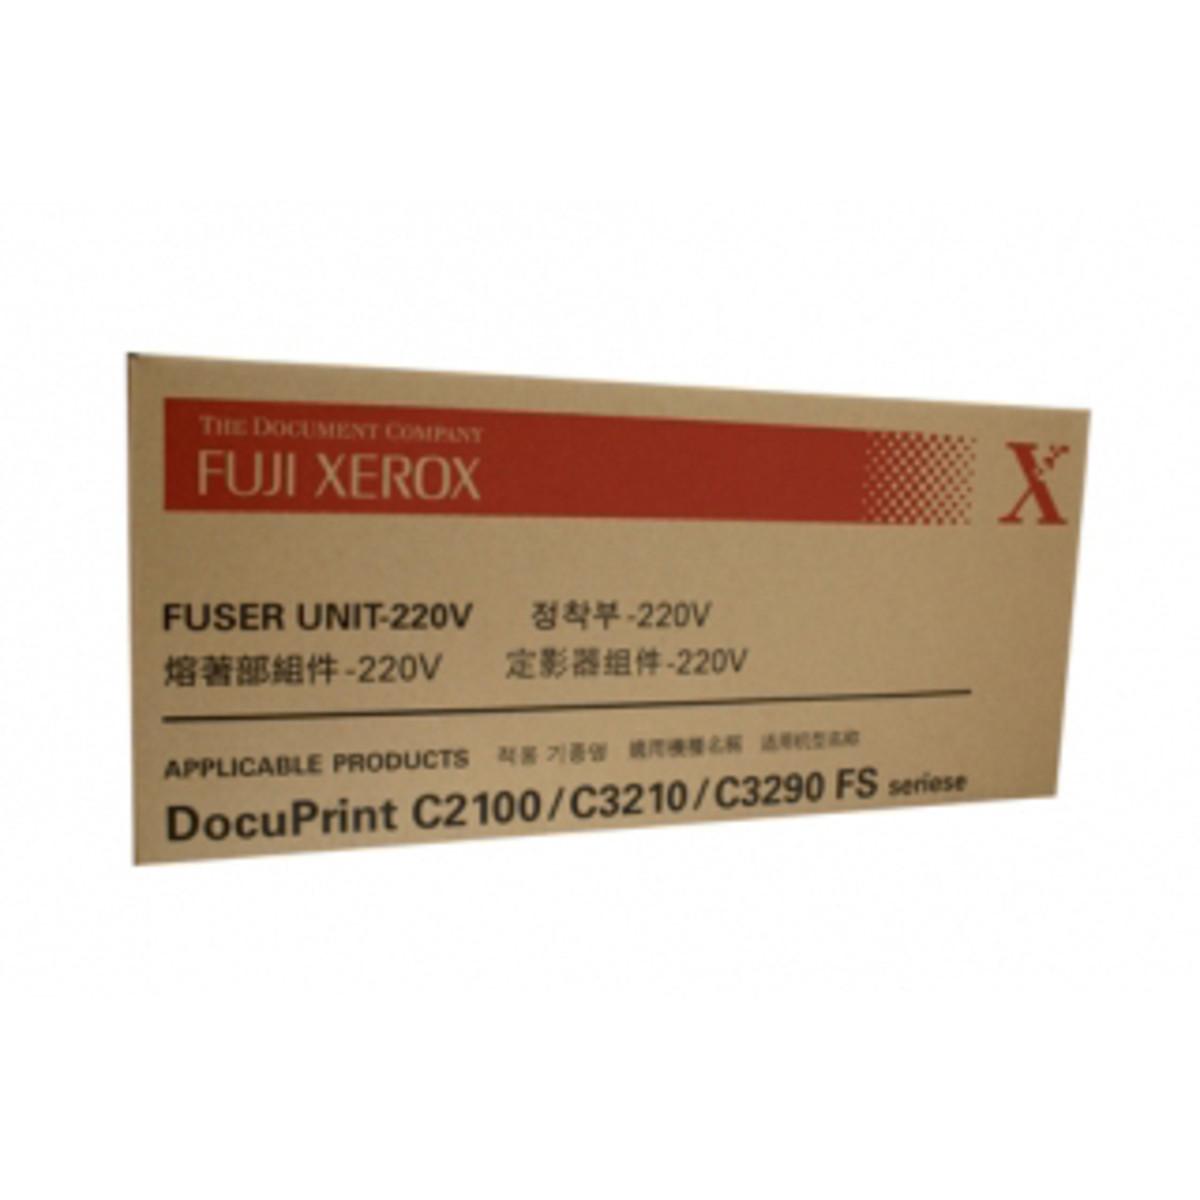 Xerox DPC2100/3210DX/3290 Fuser Unit